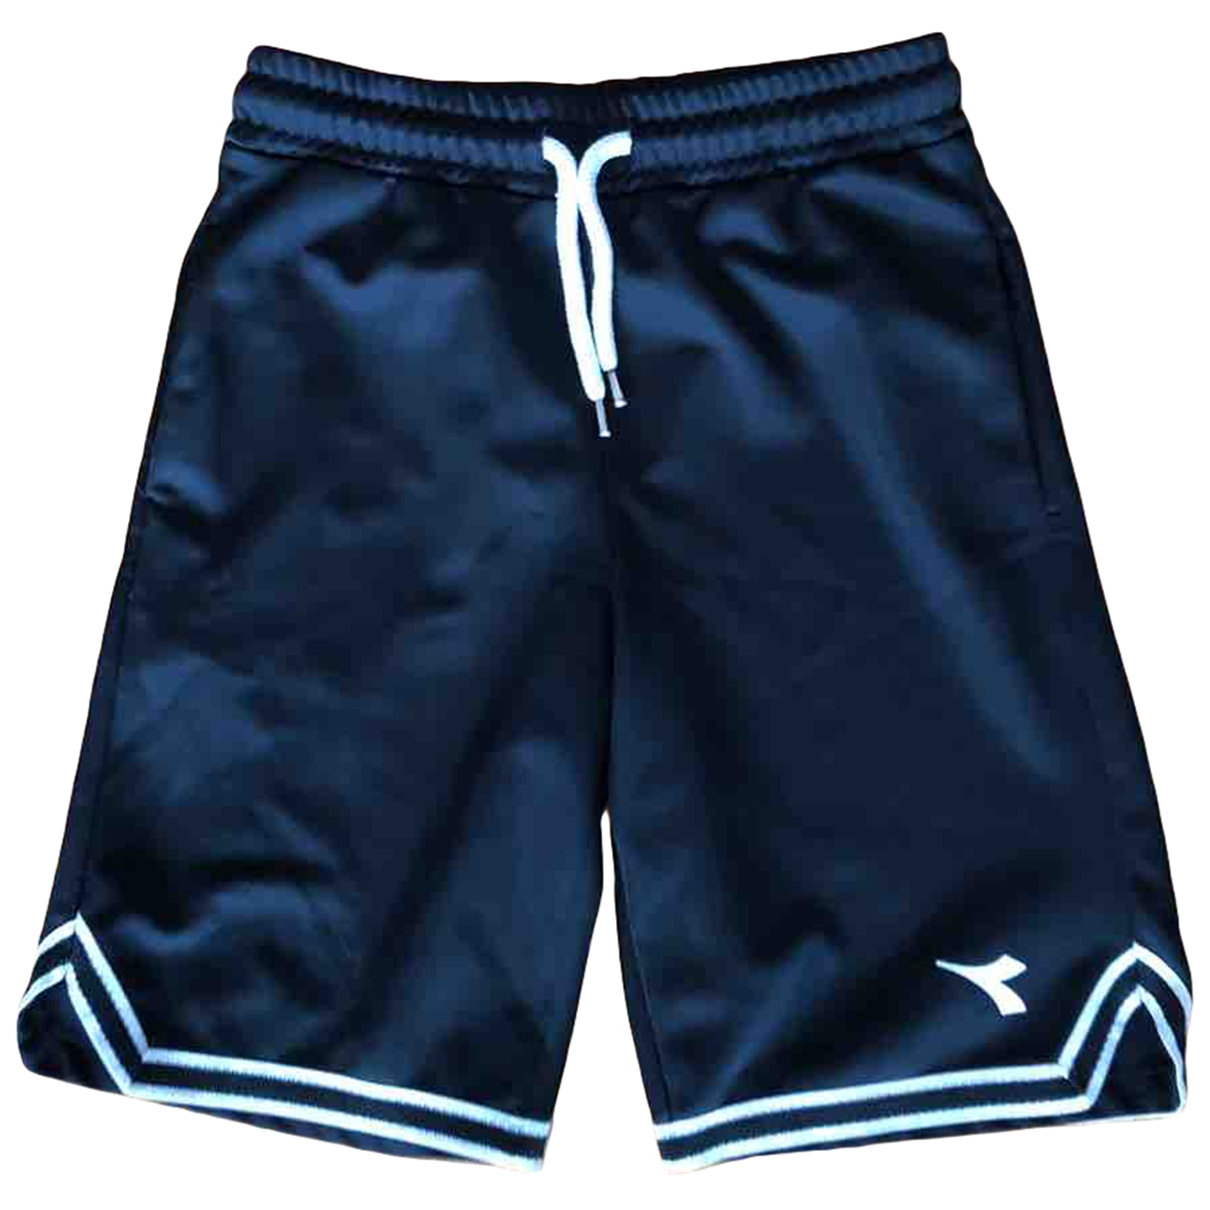 Diadora \N Shorts in  Schwarz Polyester